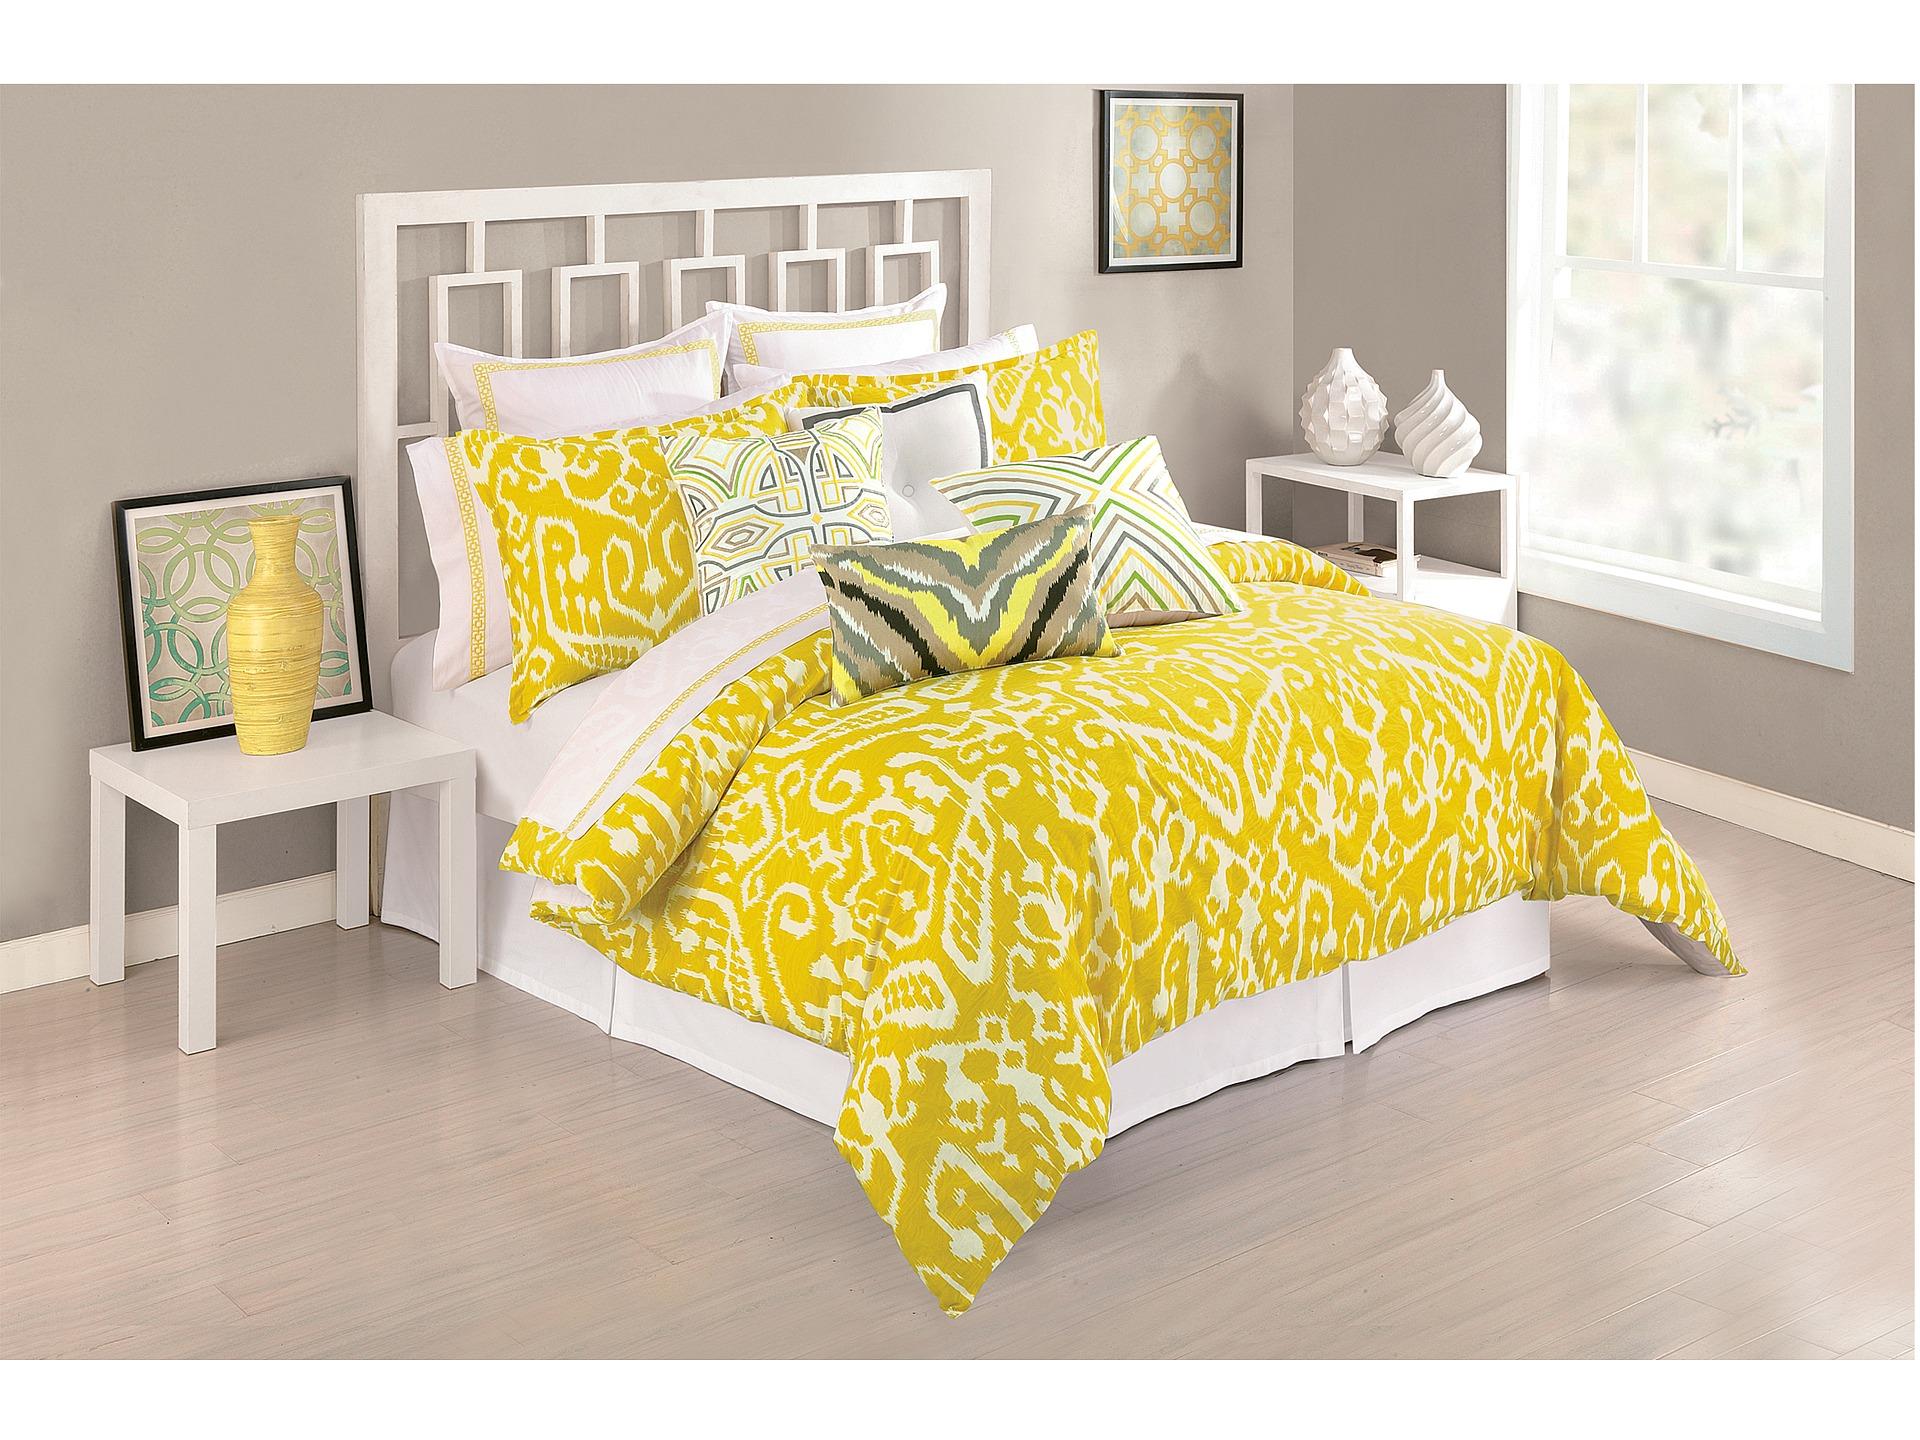 Trina turk ikat comforter set twin twin x long shipped free at